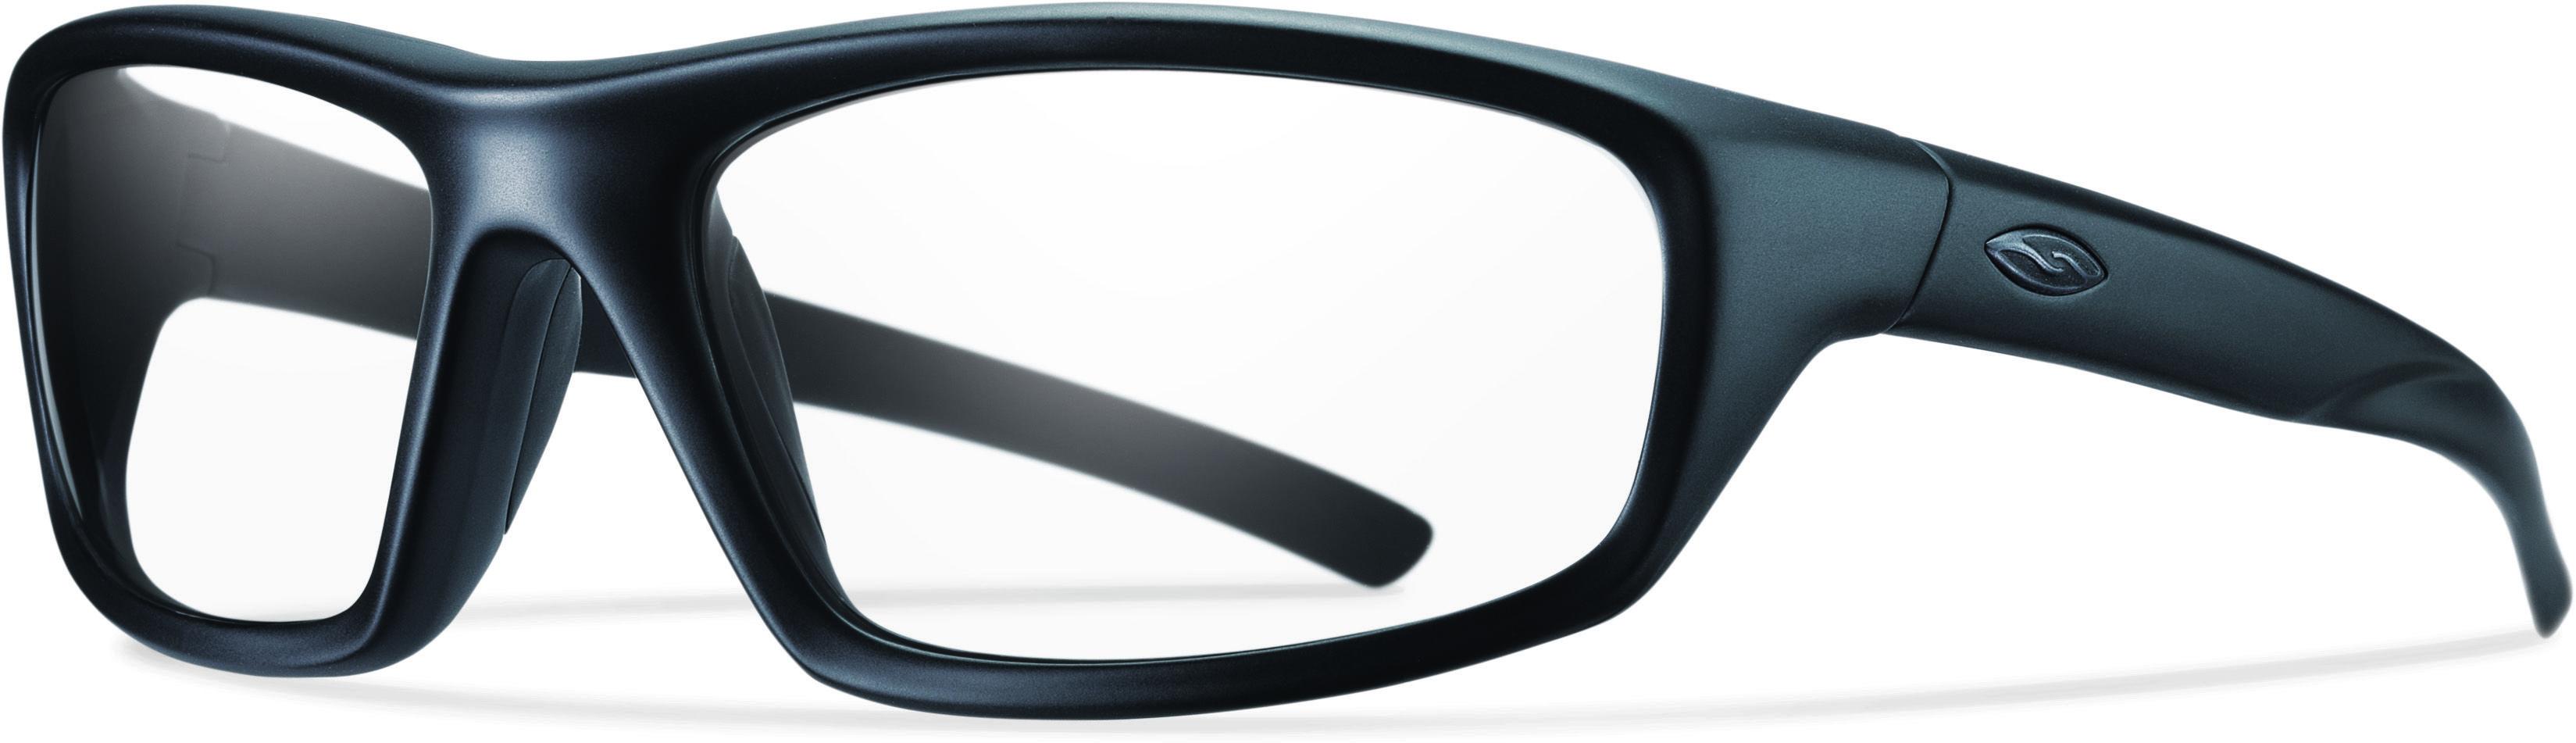 3a51c6cbc6 Smith Optics Director Tactical Black Frame Clear Lens DITPCCL22BK